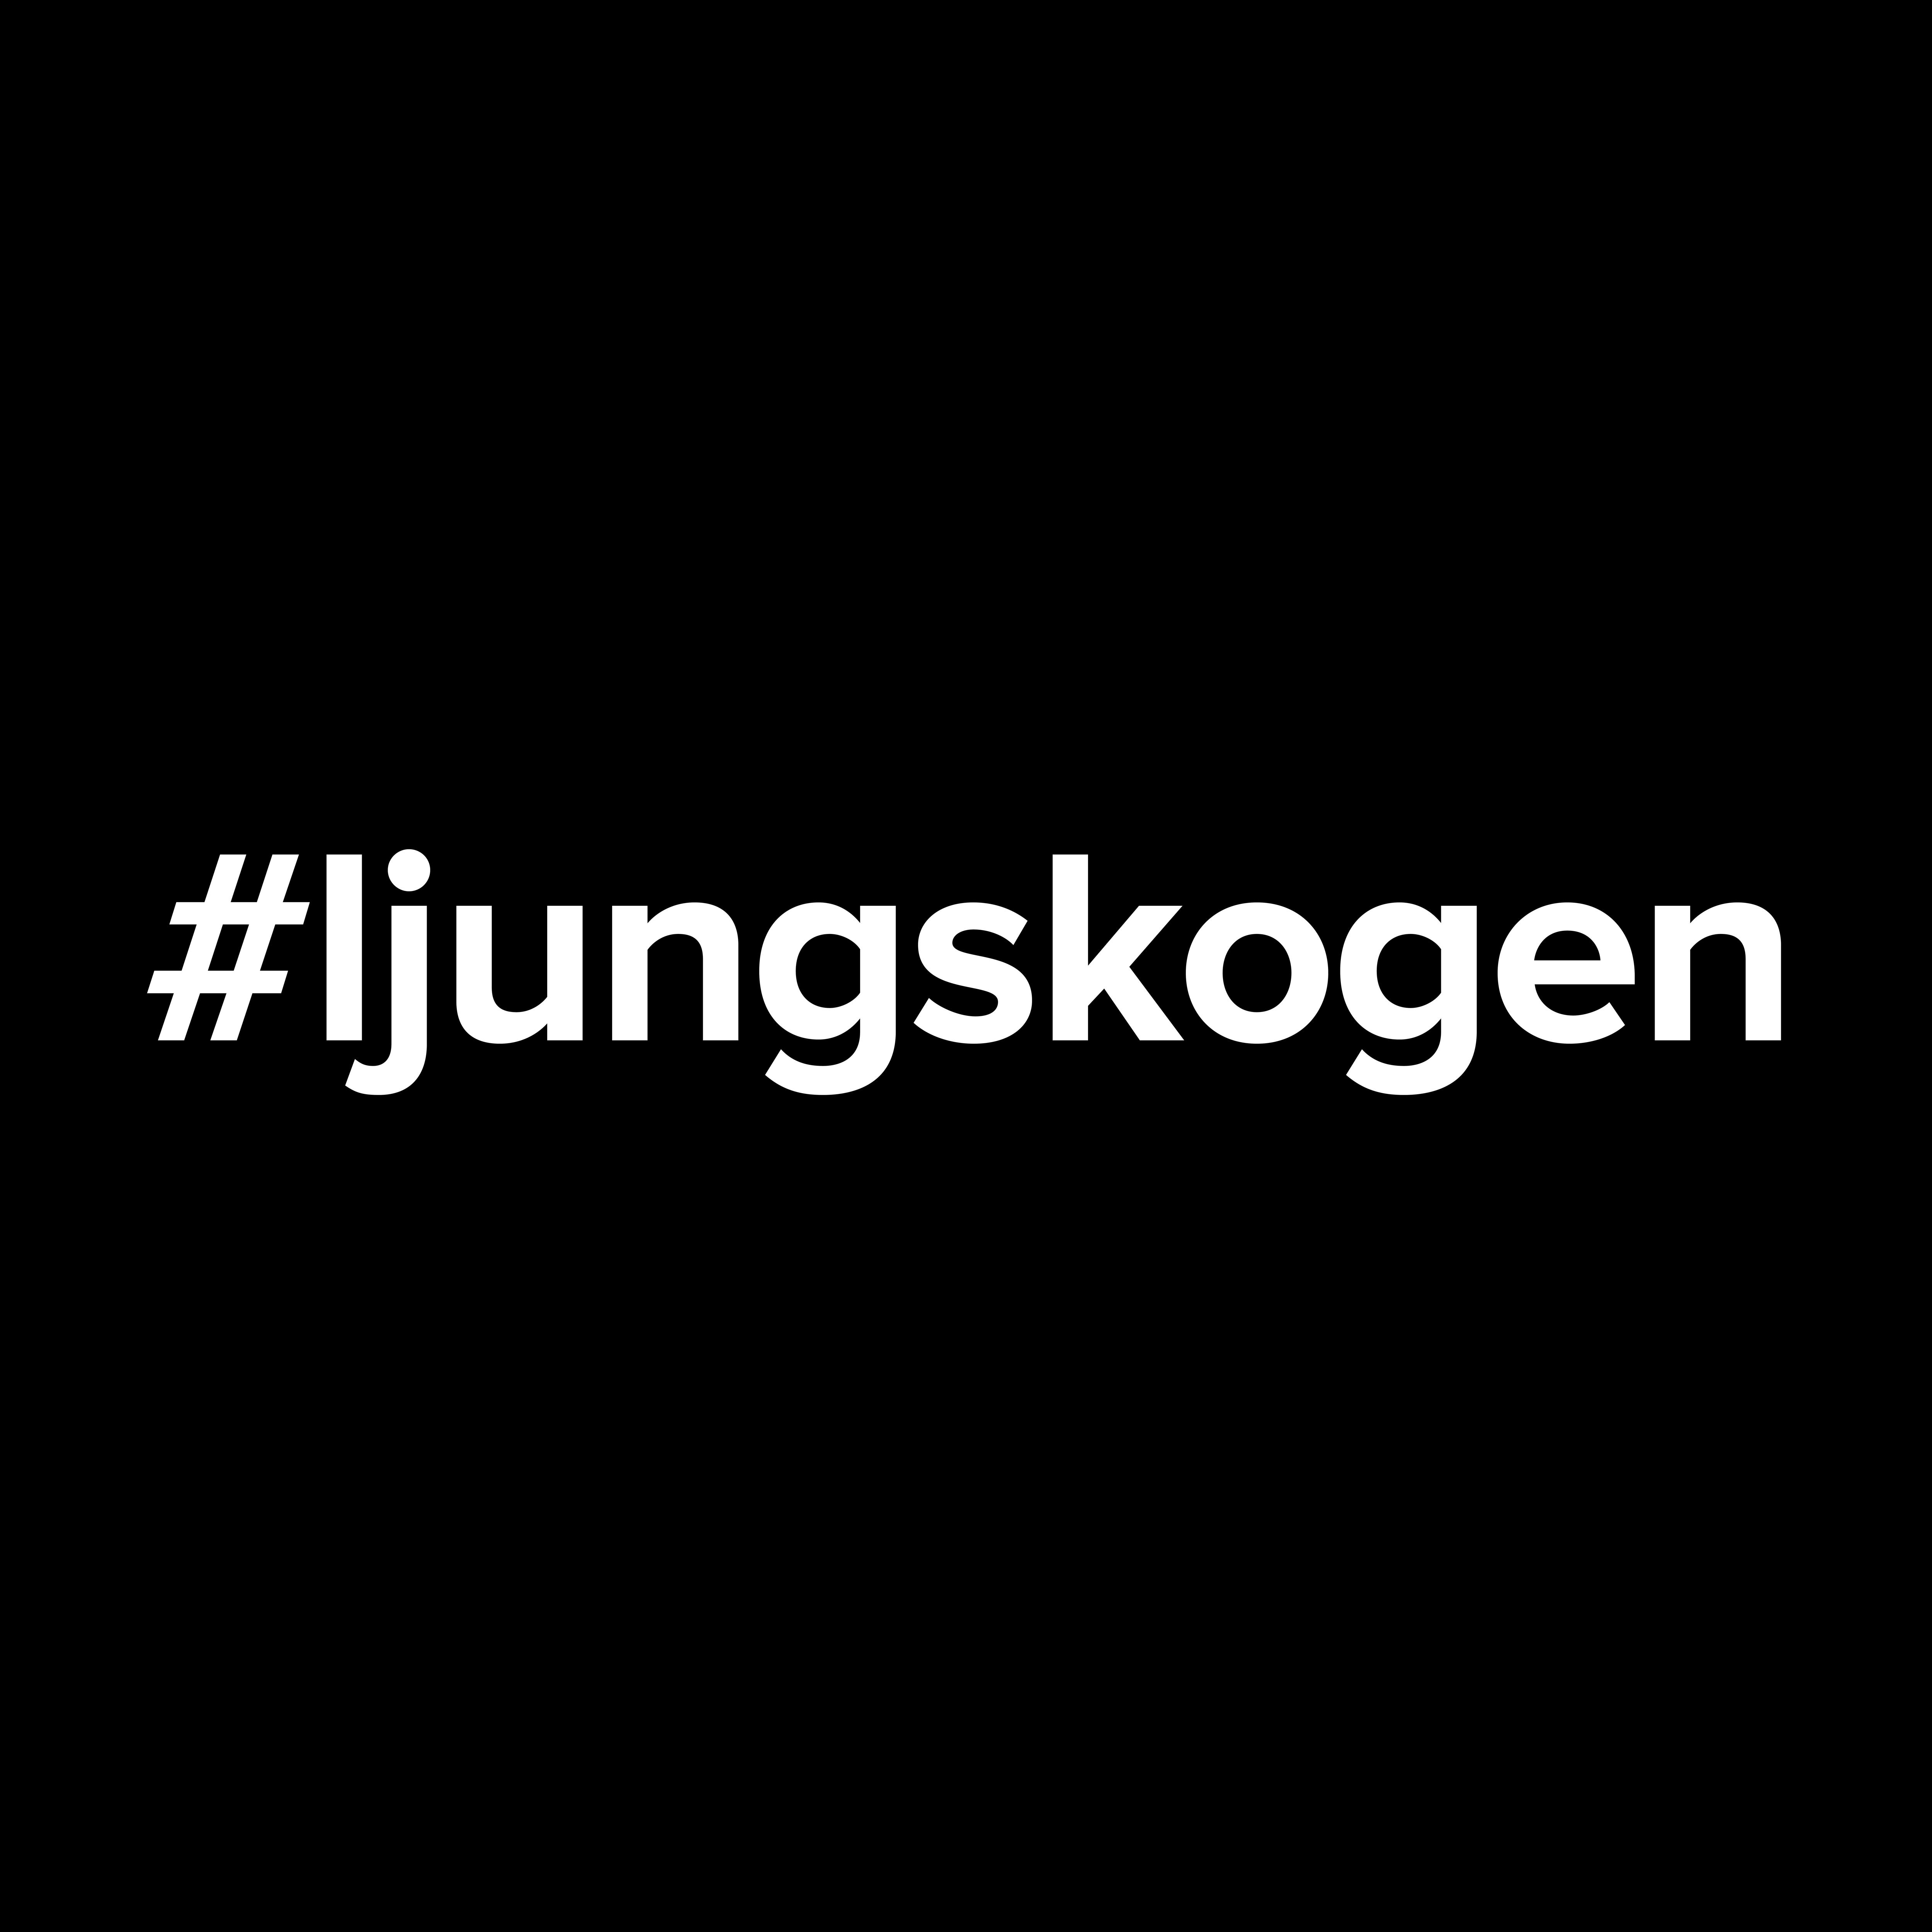 Logo #ljungskogen - Ljungskogen - @ljungskogen